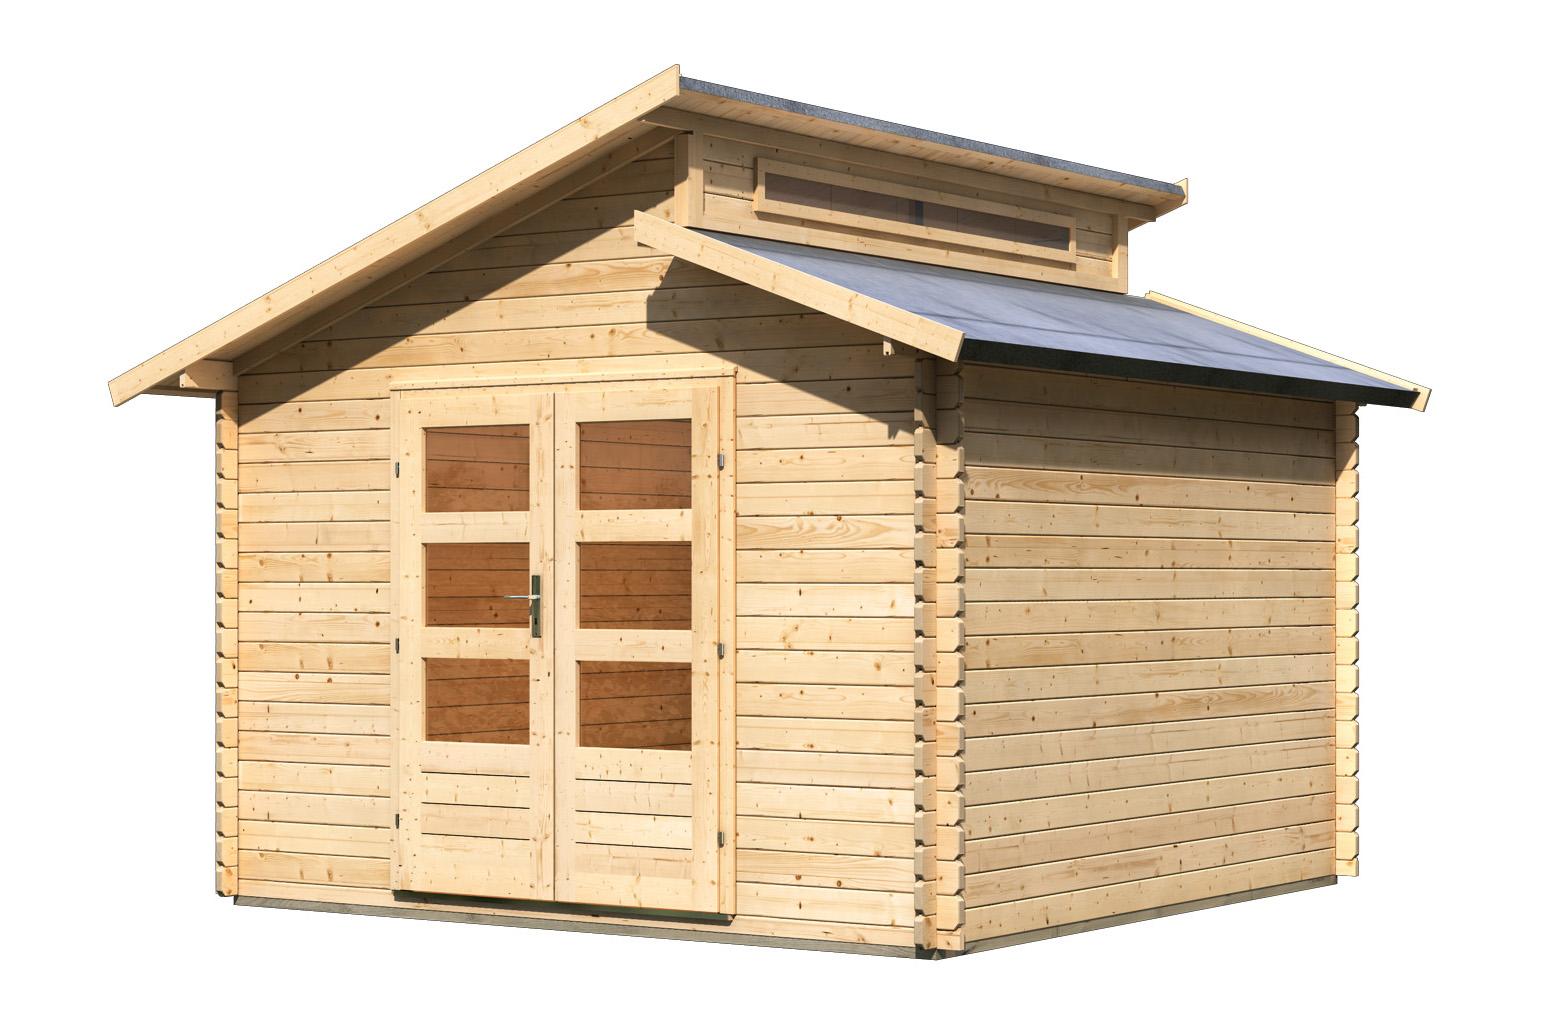 gartenhaus v rmland gr nelo grauburg g nstig kaufen online shop. Black Bedroom Furniture Sets. Home Design Ideas